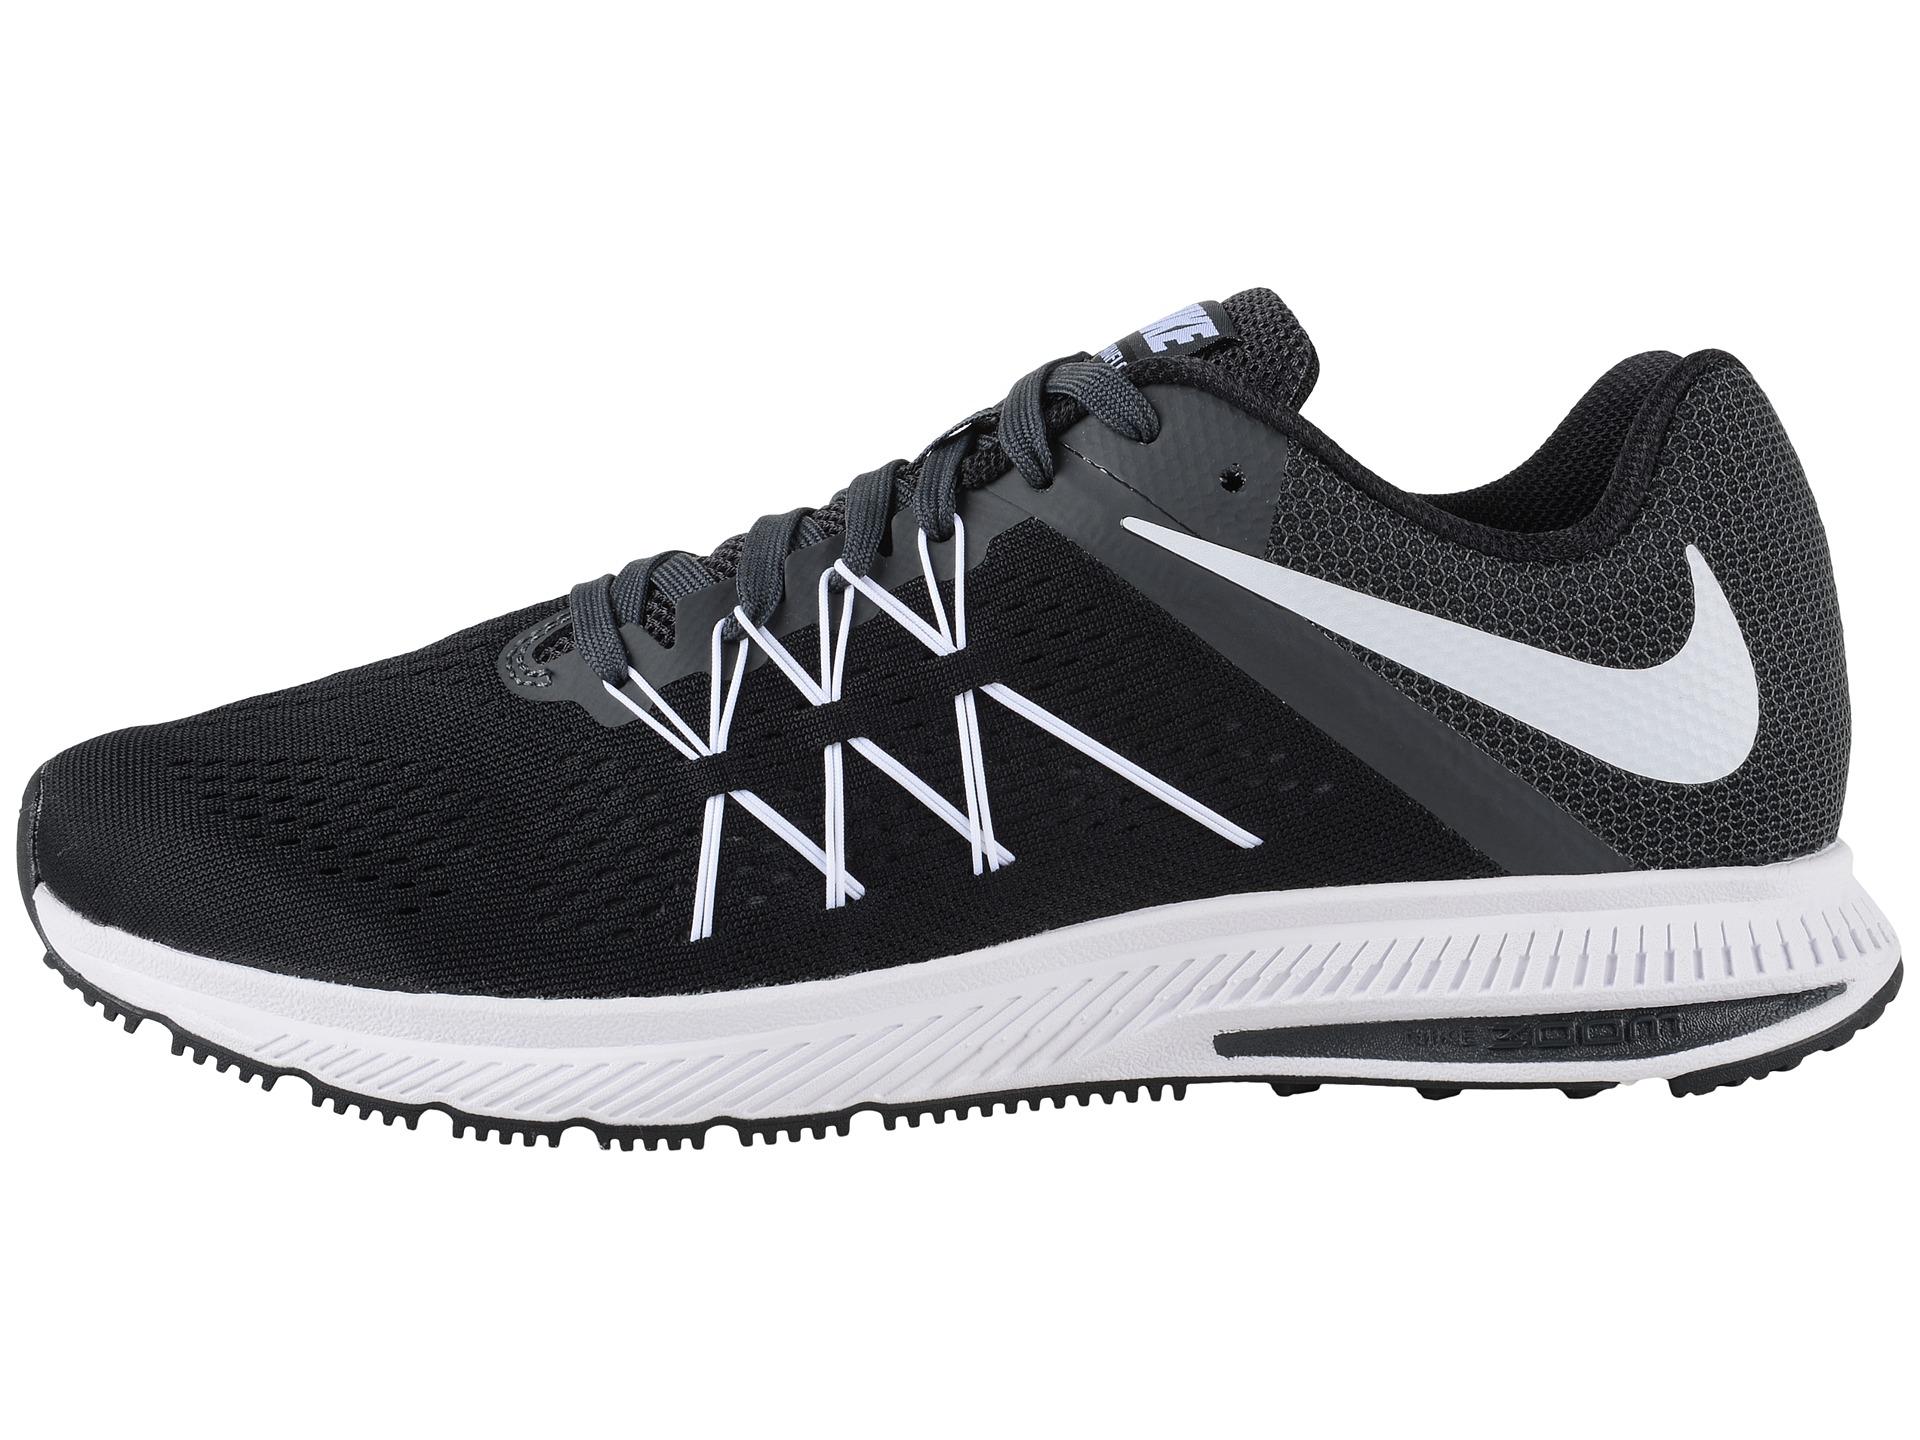 Nike Zoom Winflo 3